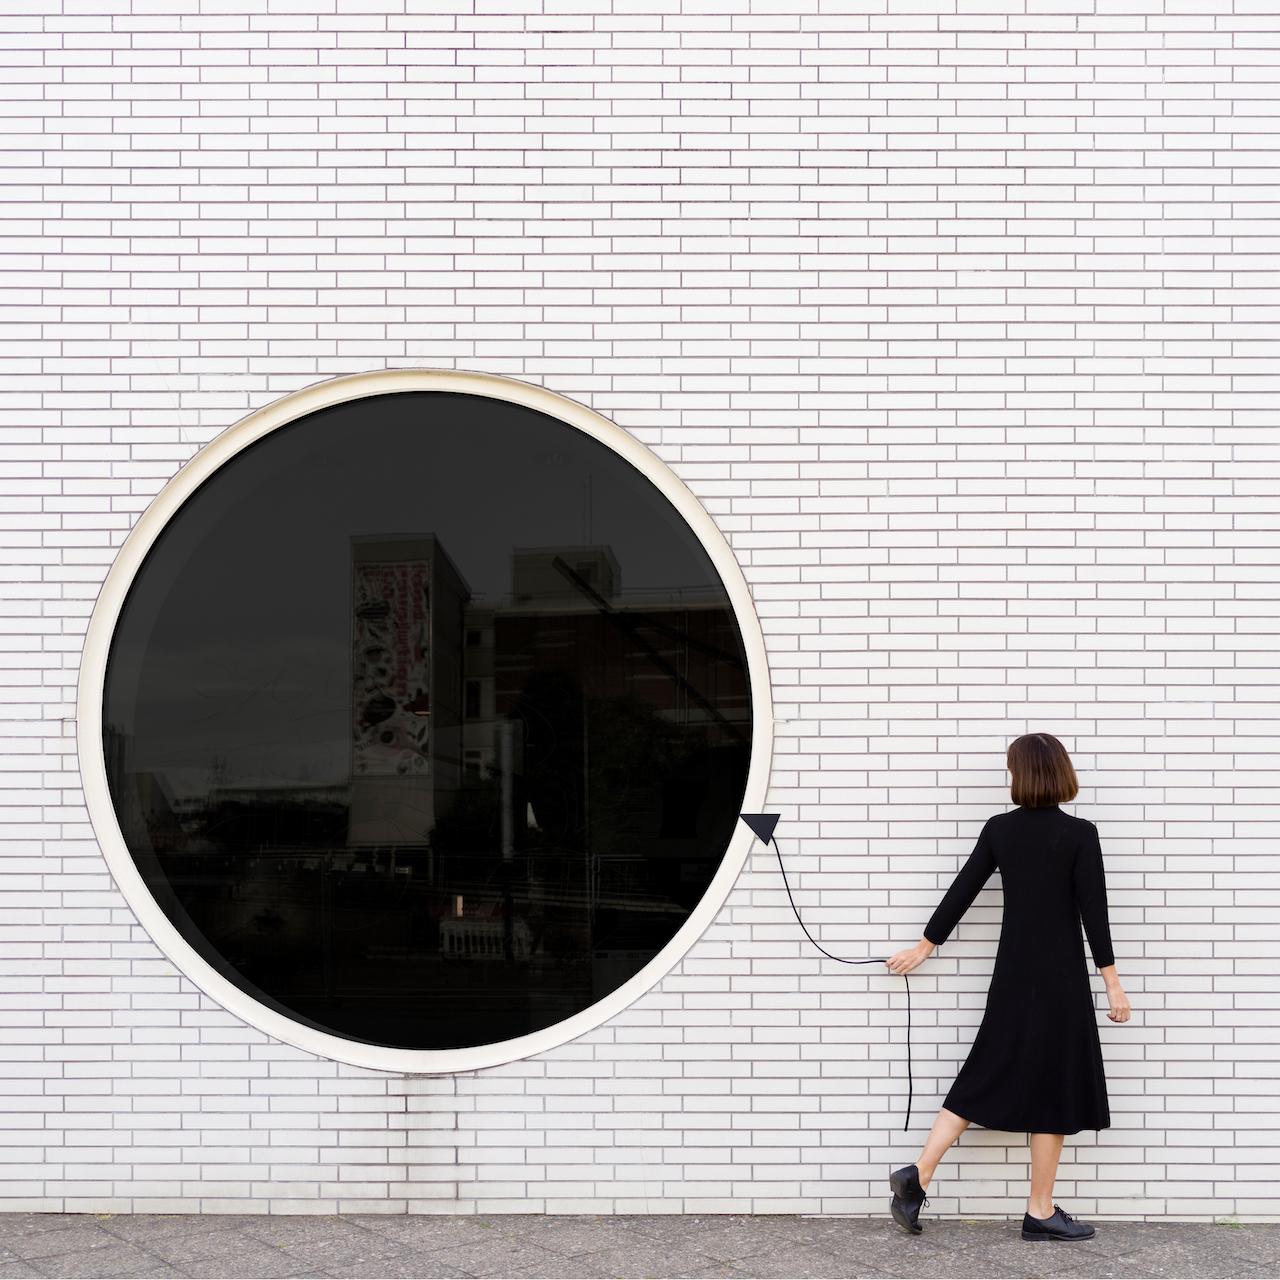 Annandaniel Anniset DrCuerda Anna Devís Daniel Rueda Happytecture Creative Minimal Surreal Fine Art Architecture Photography Balloonatic